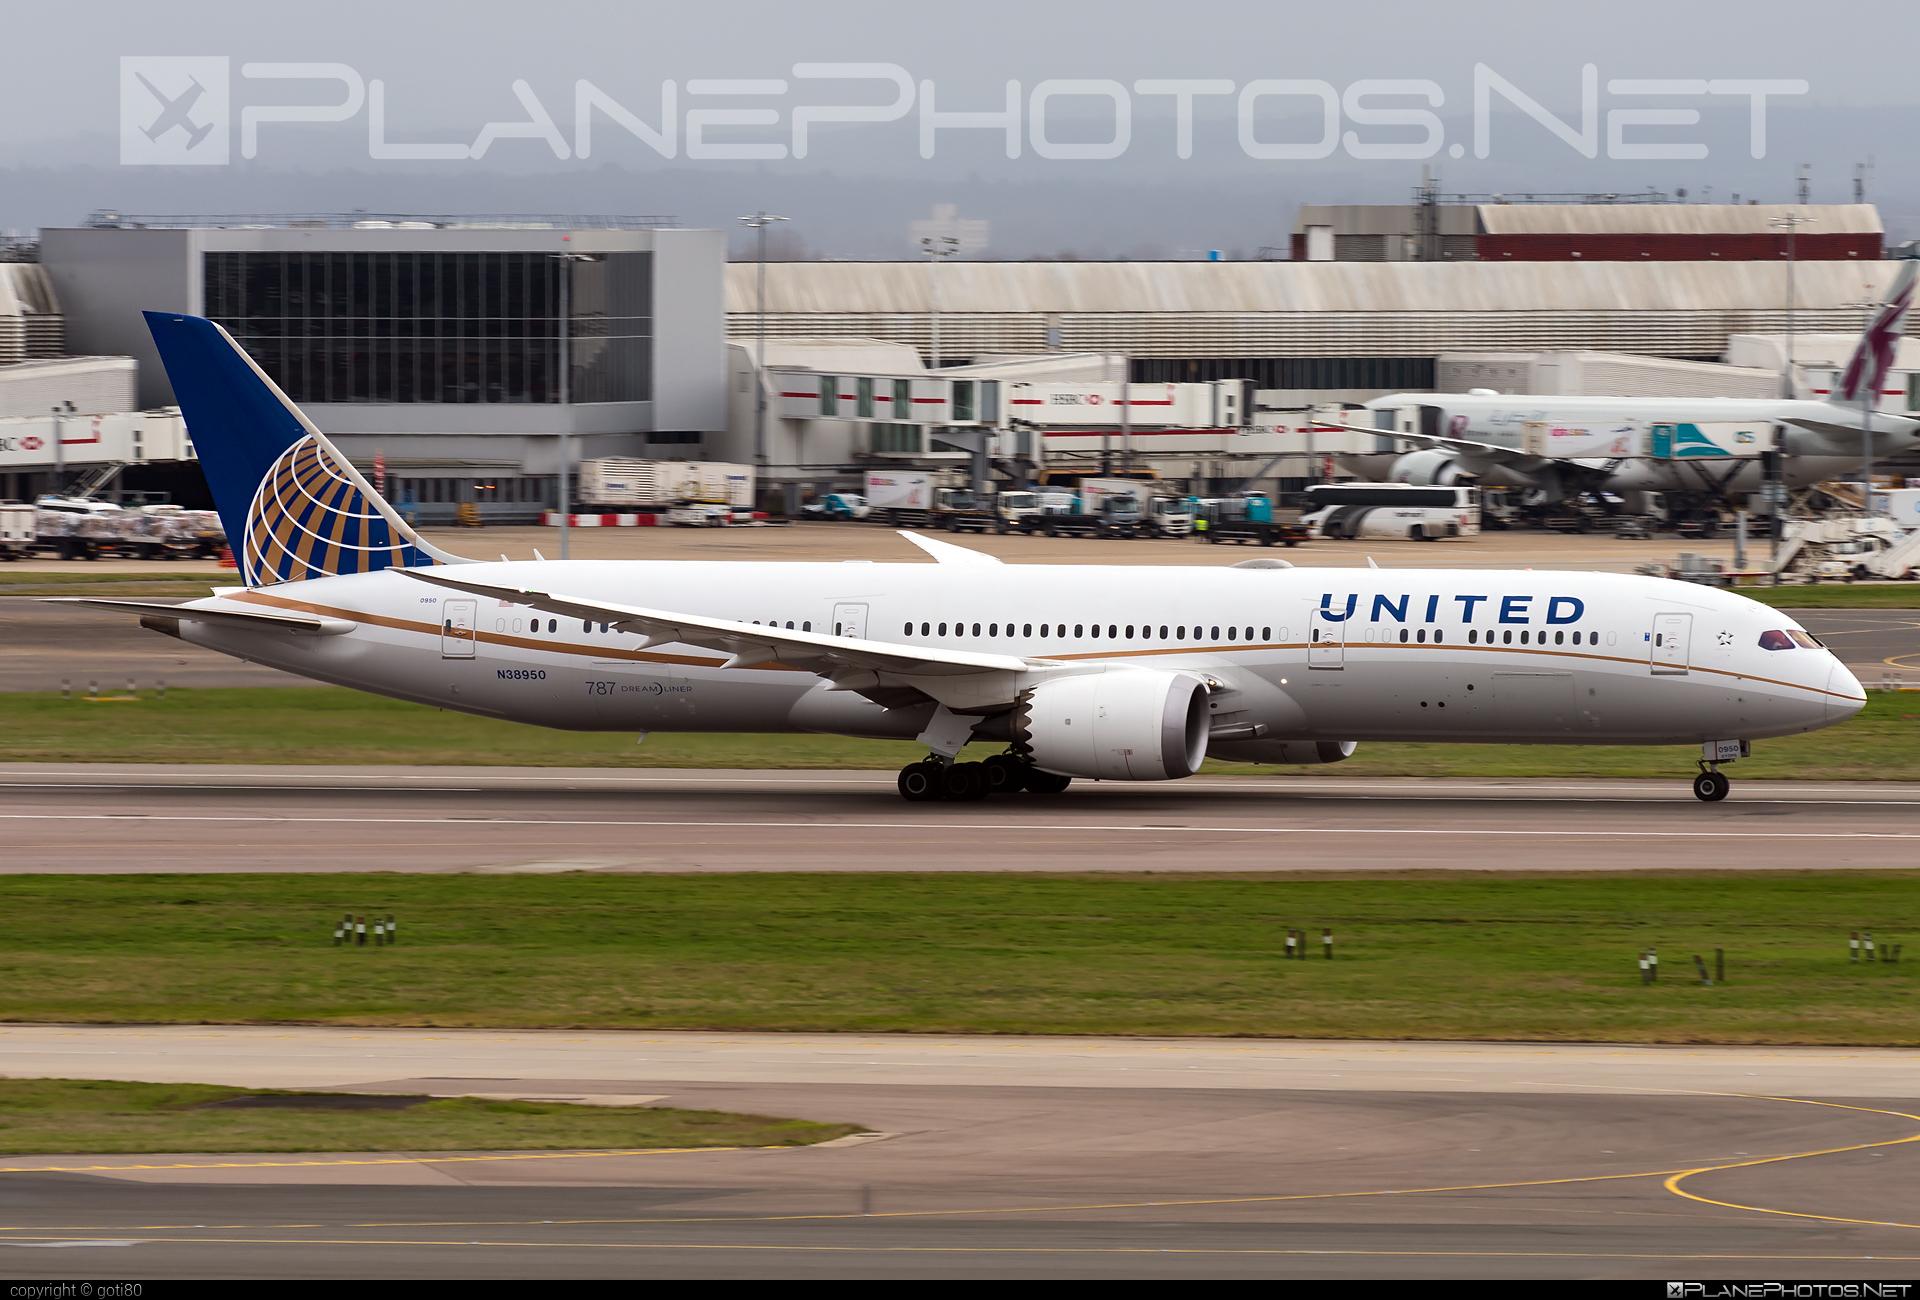 Boeing 787-9 Dreamliner - N38950 operated by United Airlines #b787 #boeing #boeing787 #dreamliner #unitedairlines